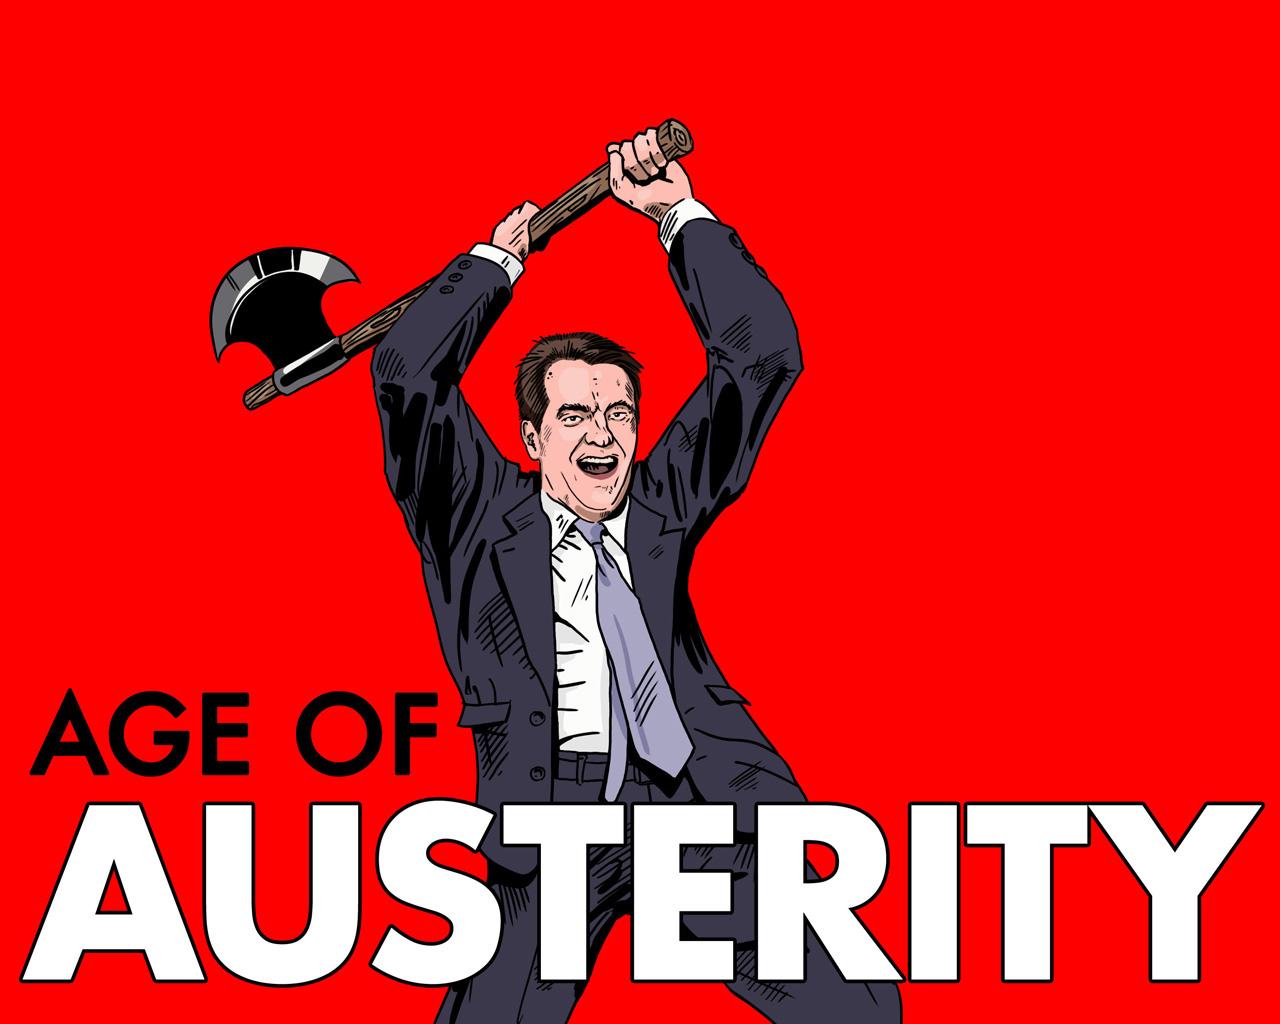 age+of+austerity+george+osborne+desktop.jpg?width=300